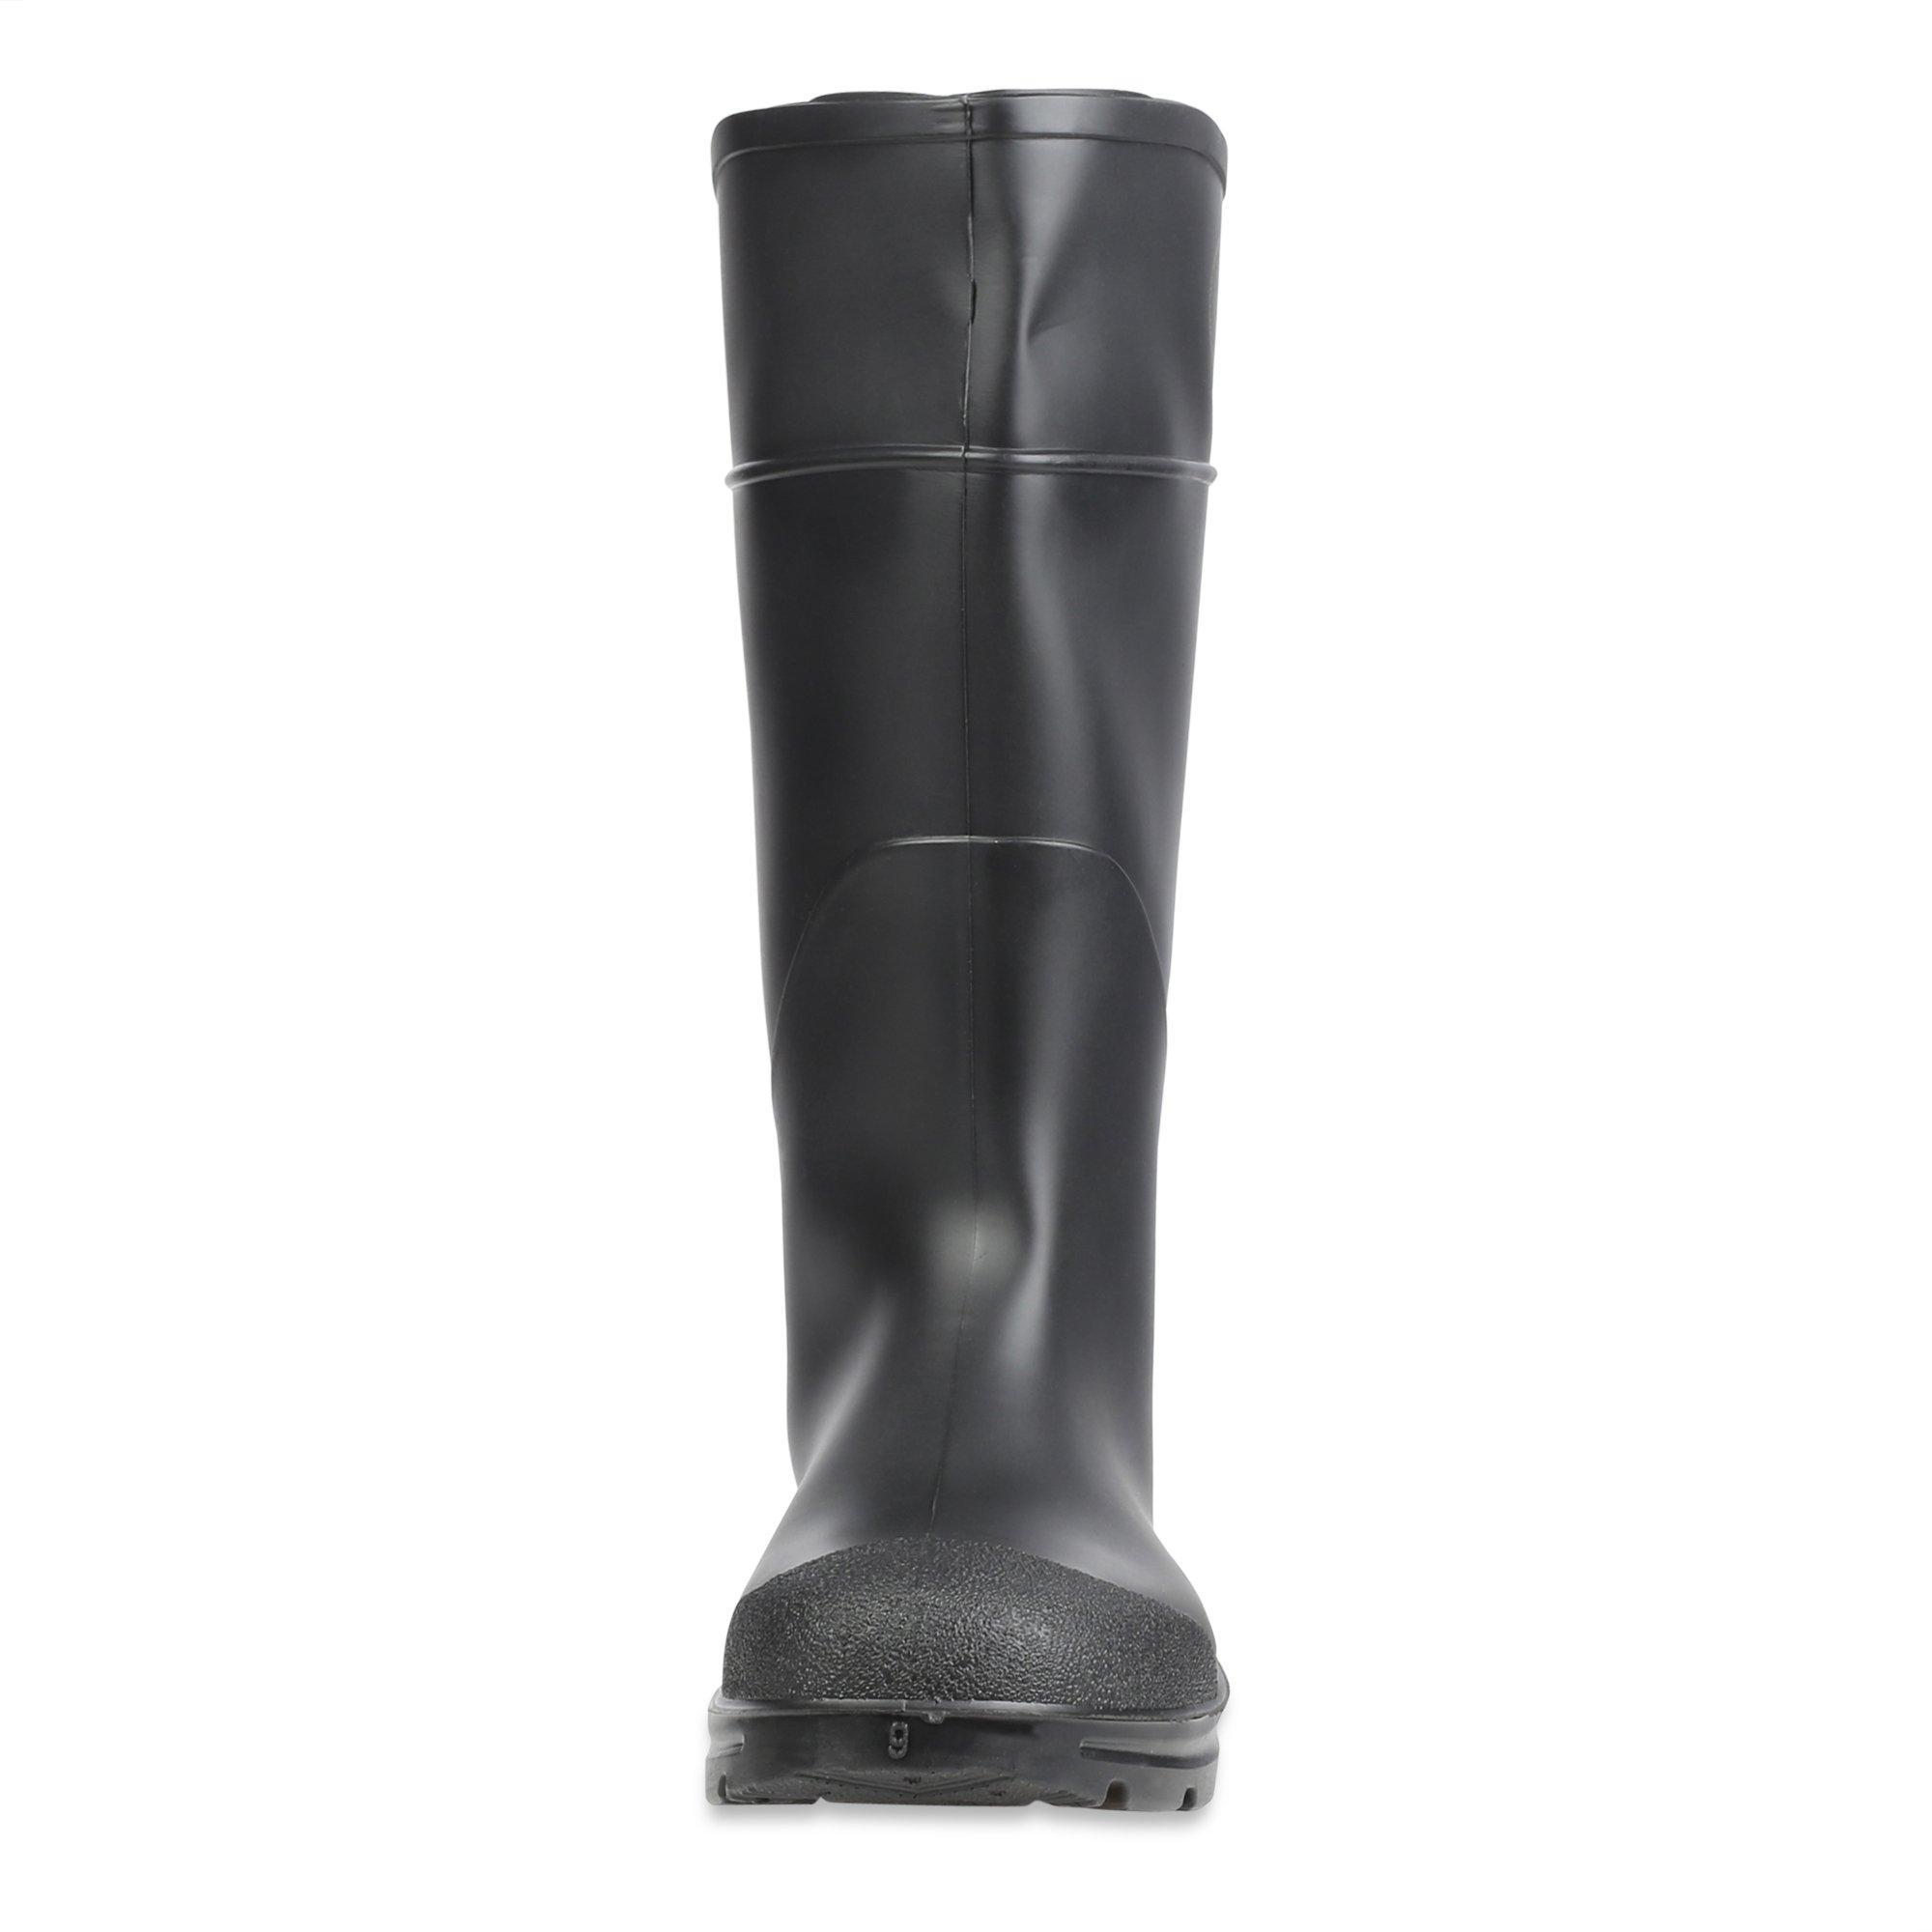 Servus Comfort Technology 14'' PVC Steel Toe Men's Work Boots, Black, Size 10 (18821) by Servus (Image #1)